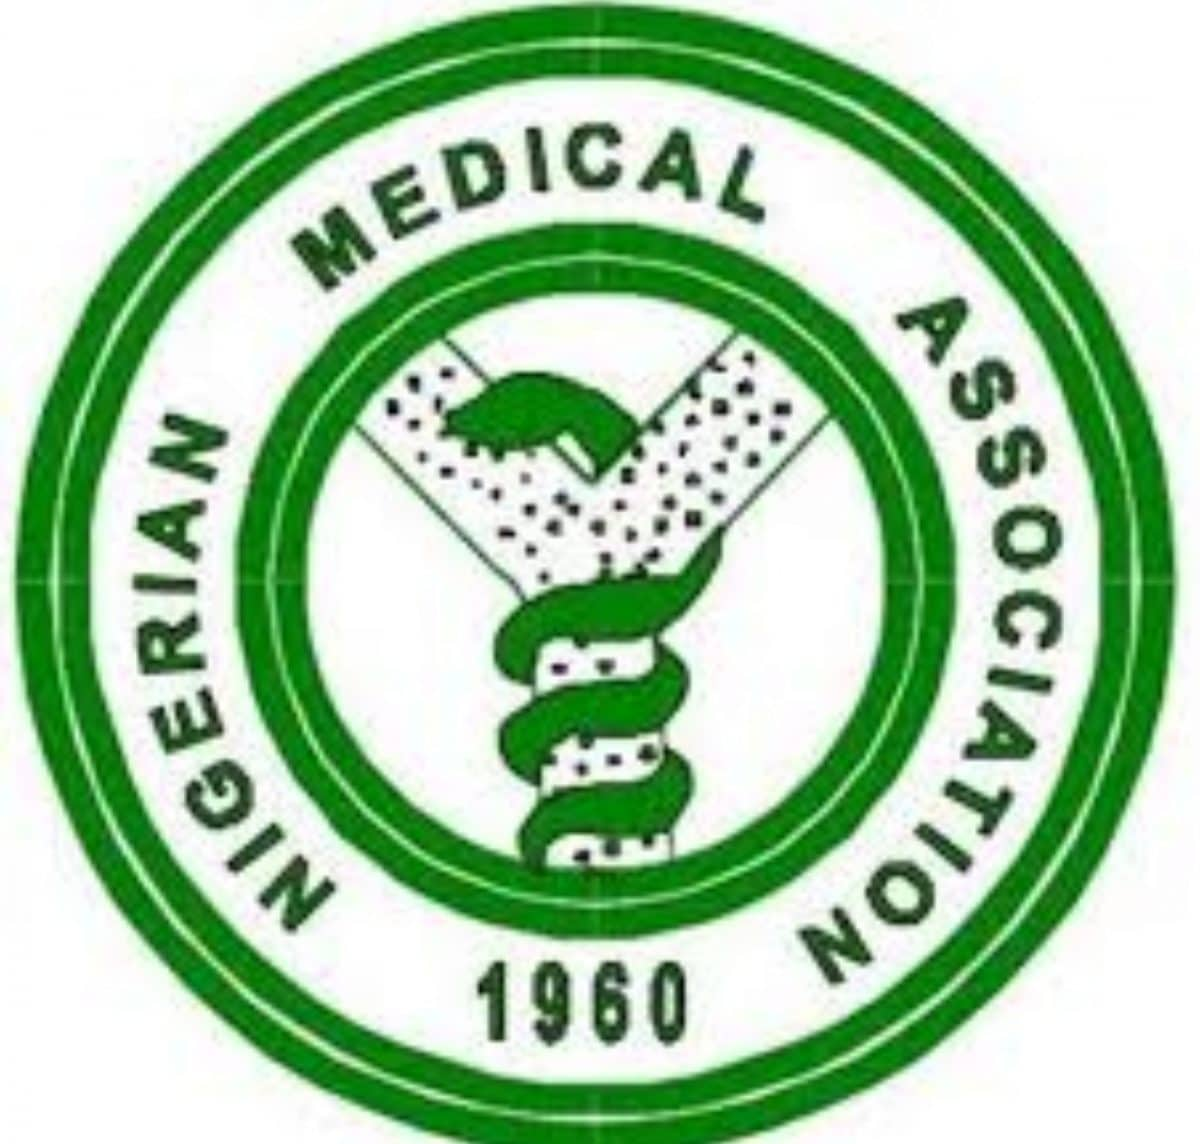 NMA - NMA calls for mandatory enrolment into NHIS